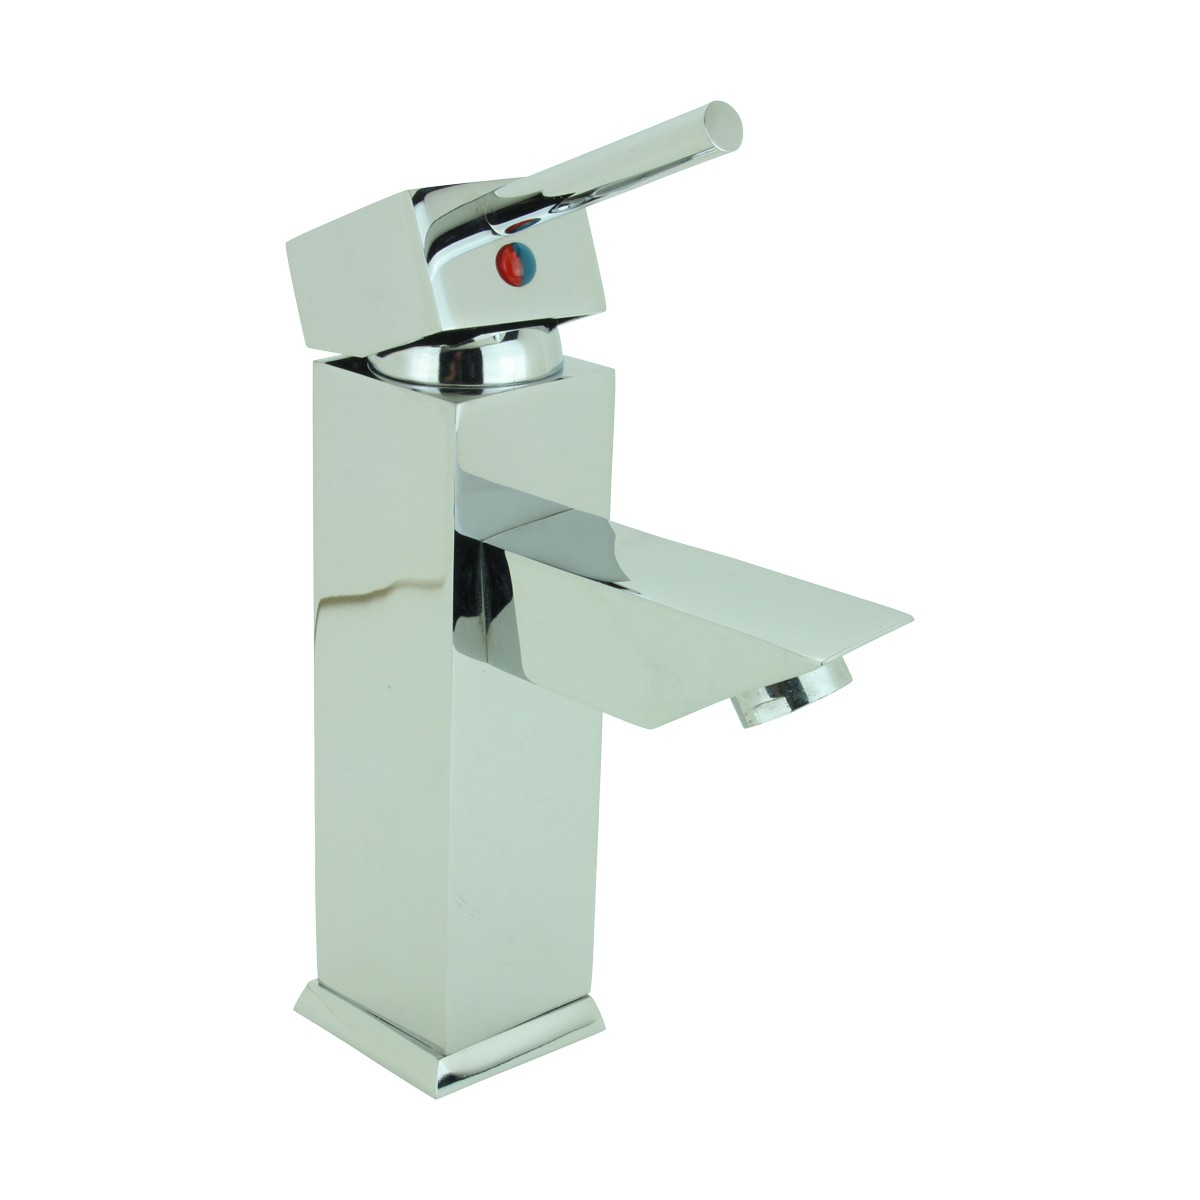 Bathroom Faucet Chrome Plated Square Single Hole 1 Handle Chrome Square Bathroom Faucet Brass Bathroom Faucets Bathroom Faucet Single Handle